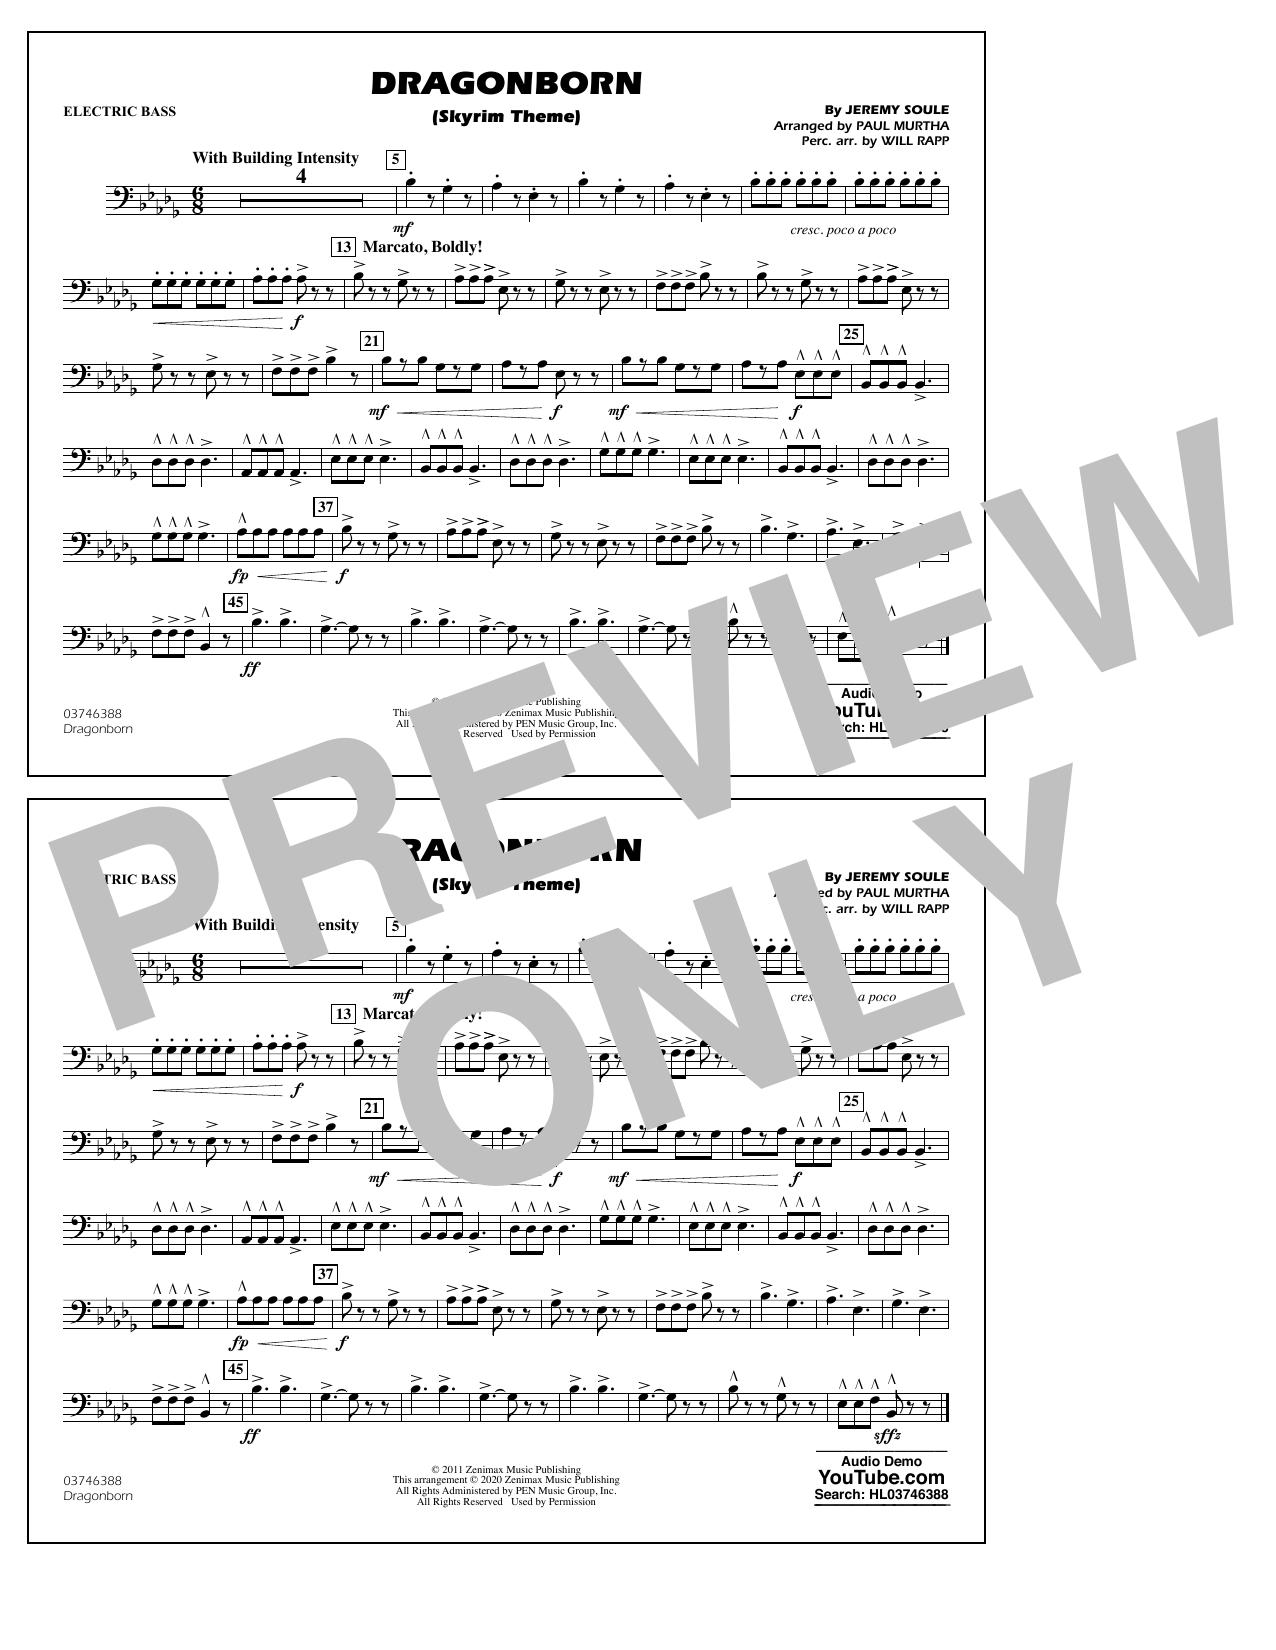 Dragonborn (Skyrim Theme) (arr. Will Rapp & Paul Murtha) - Electric Bass Sheet Music